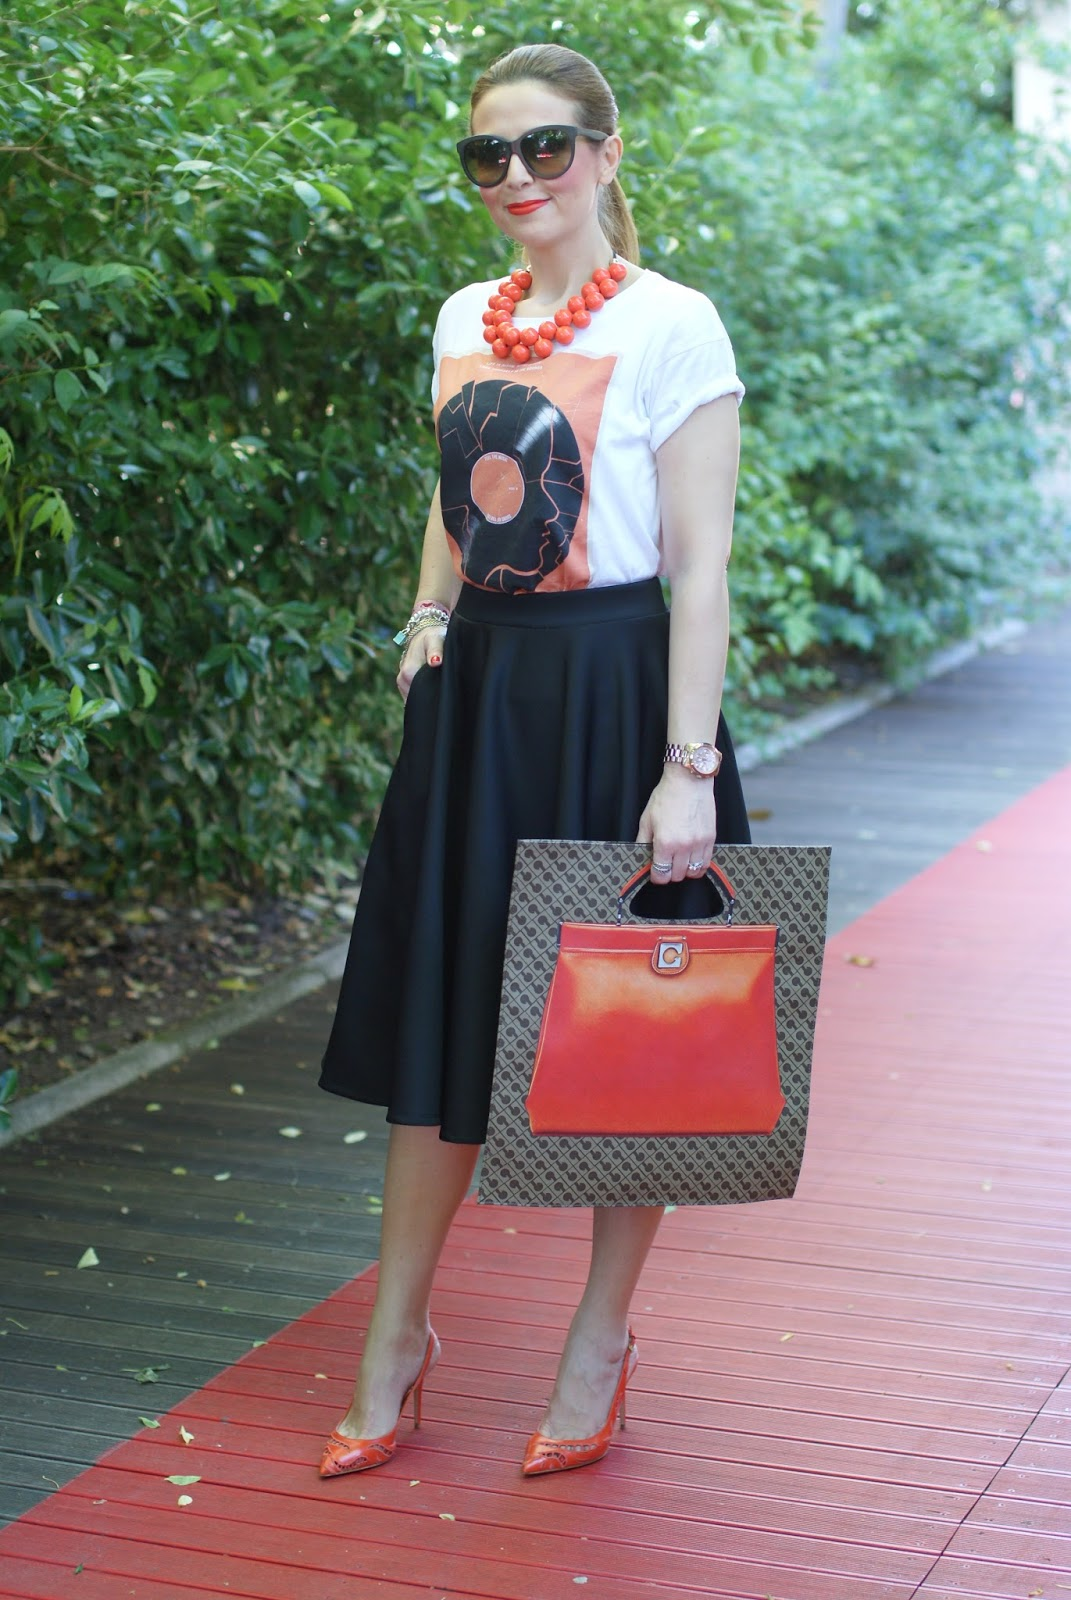 Gherardini bag, Gherardini piattina anniversary 130, Le Silla orange pumps, Asos skirt, Fashion and Cookies fashion blog, fashion blogger